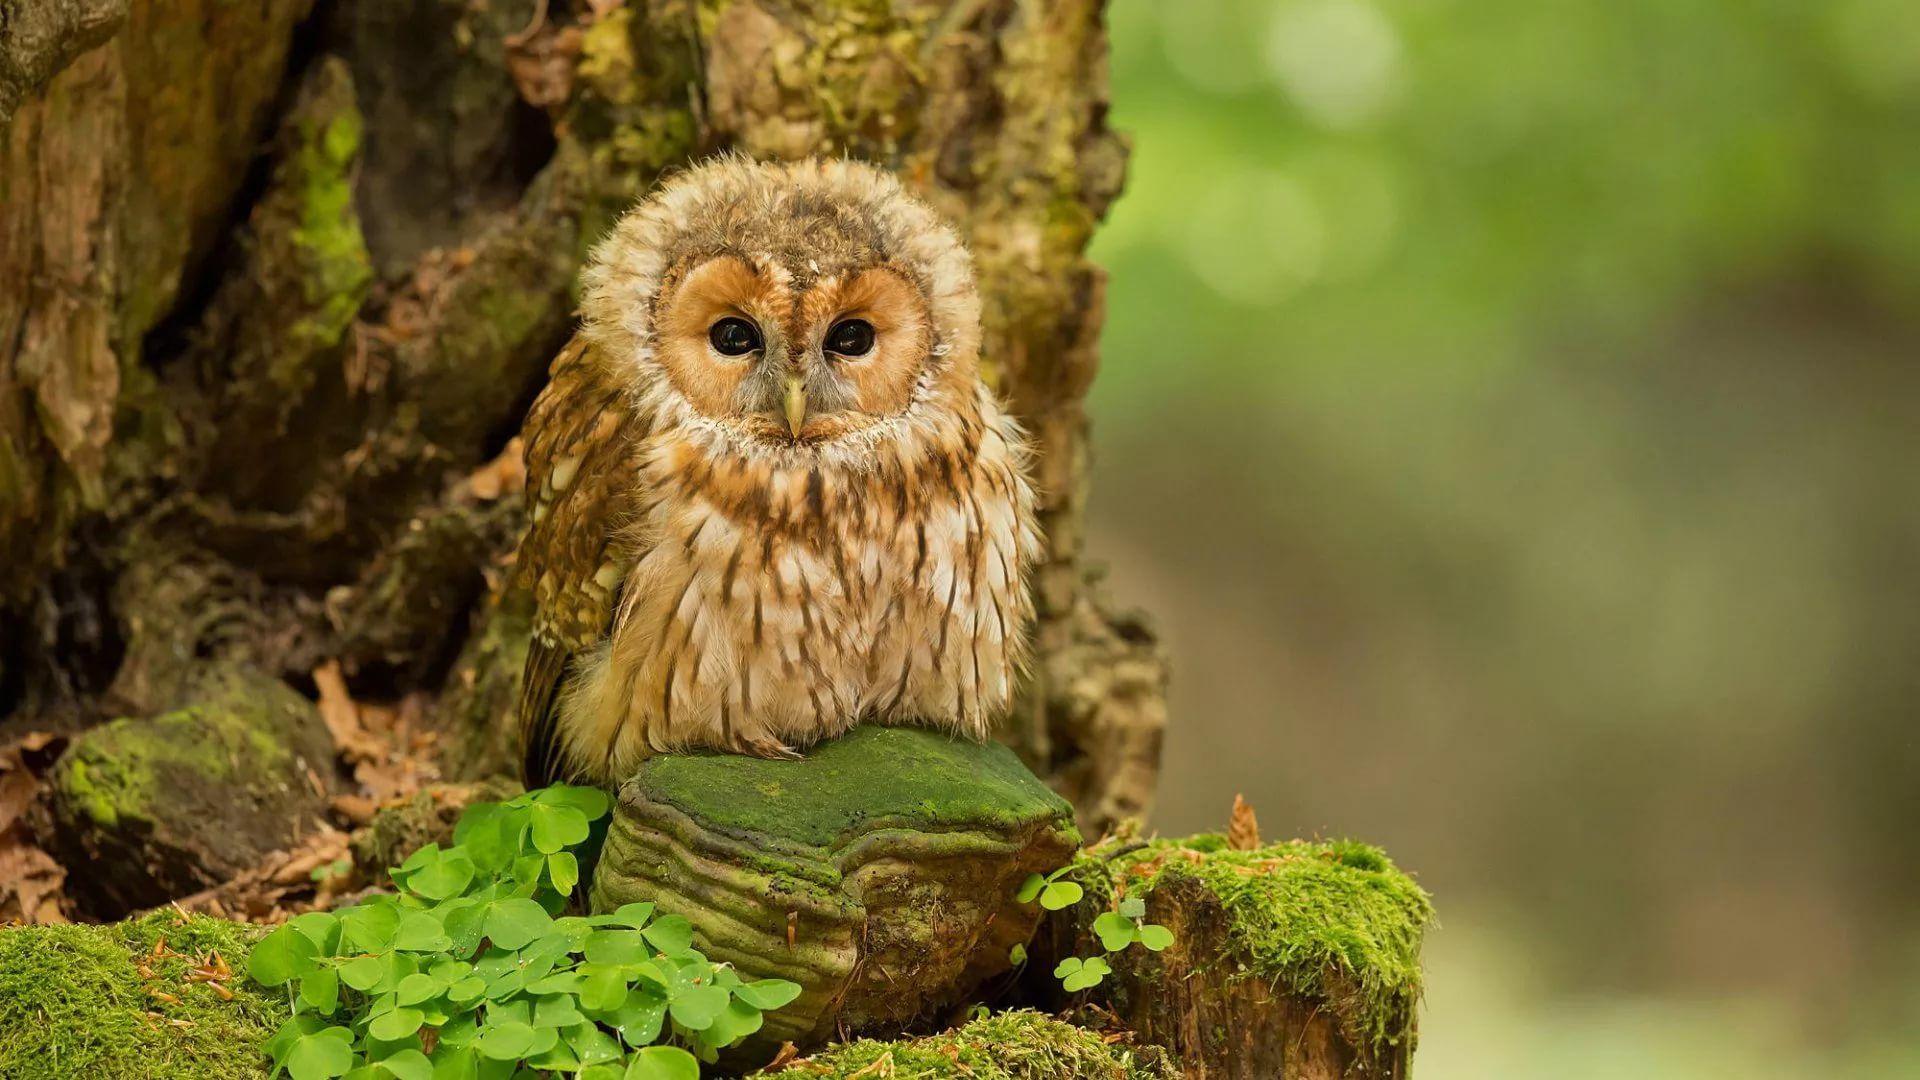 Cute Owl wallpaper photo hd